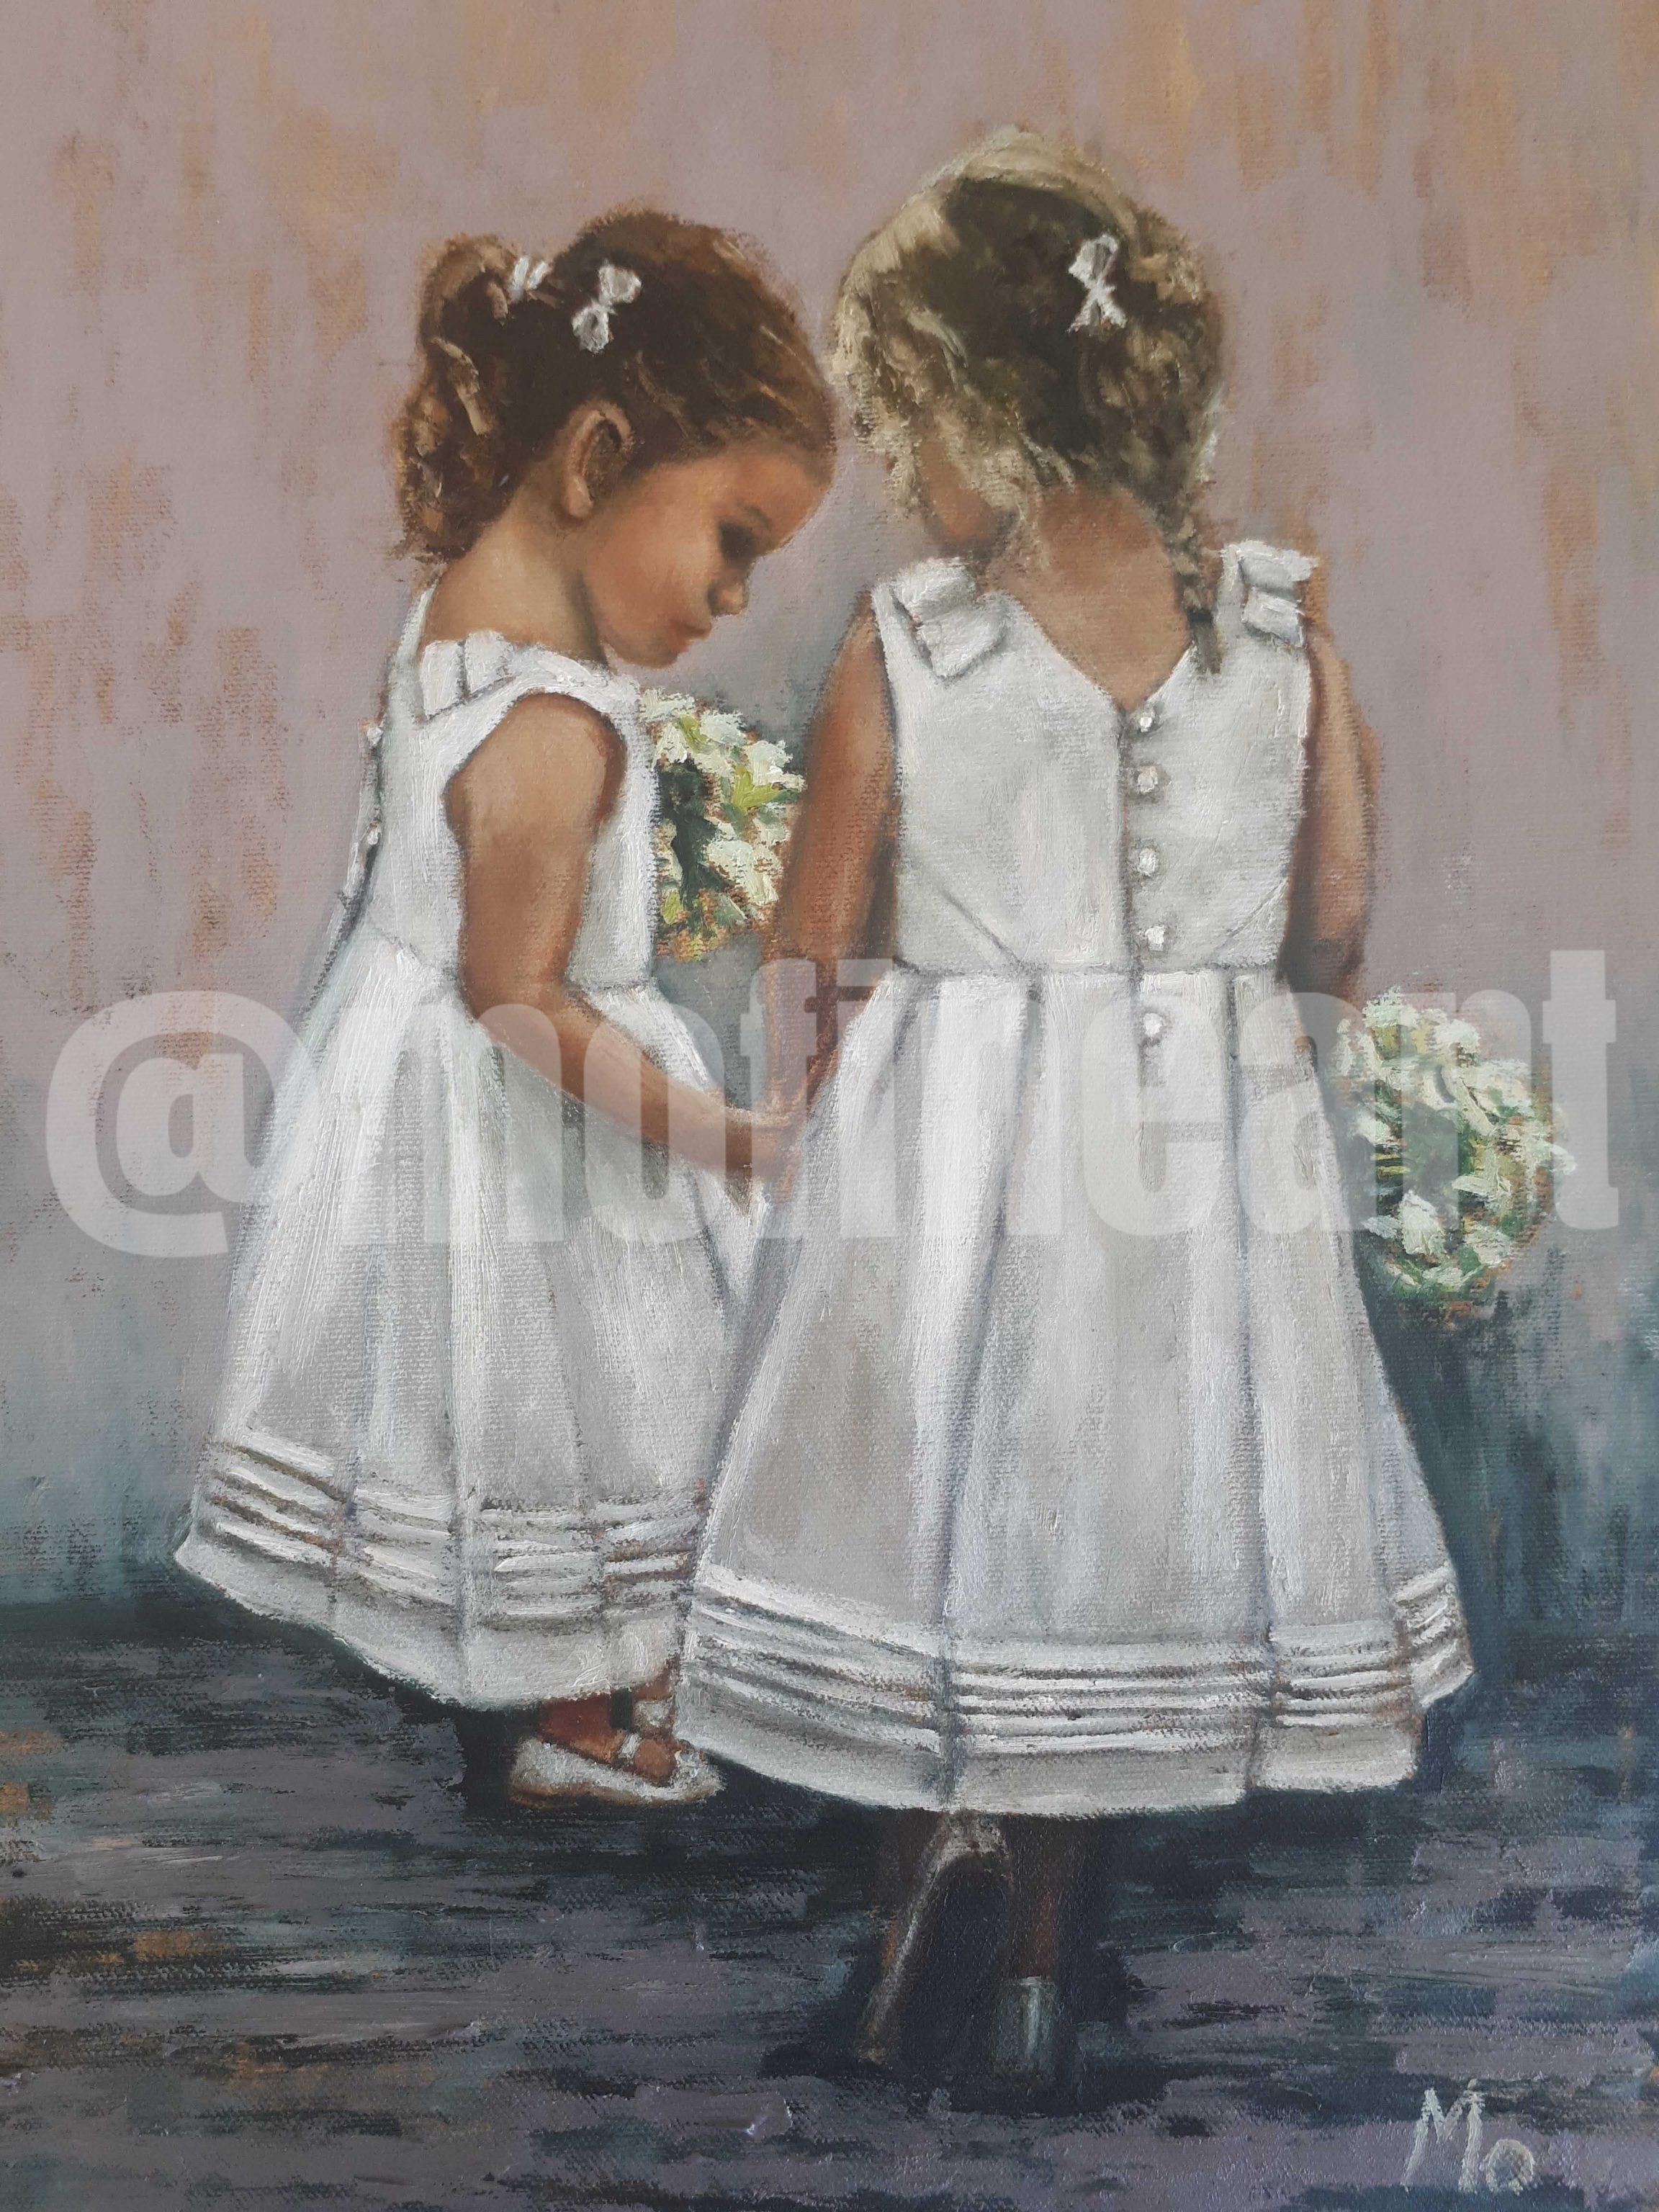 Two little girls in formal white dresses